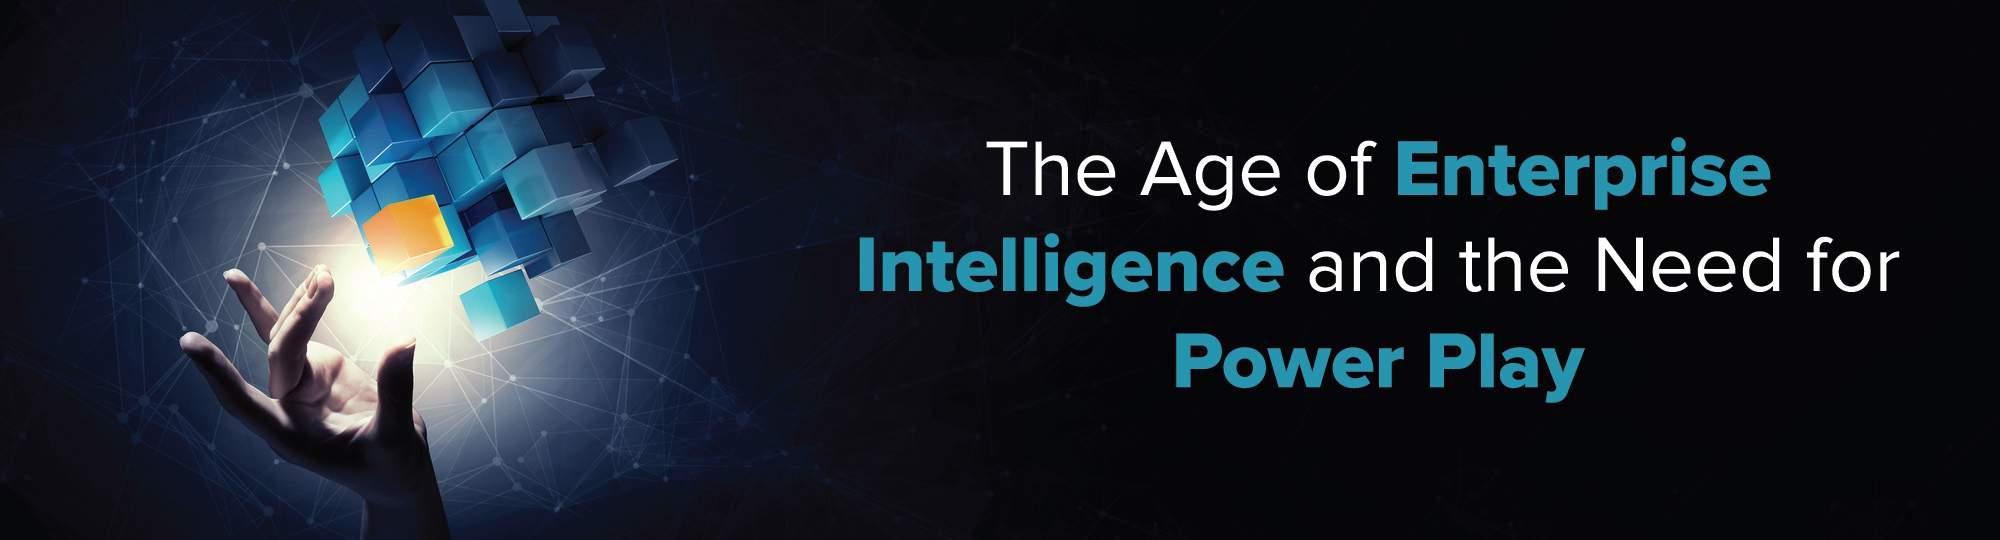 Intelligent Enterprises